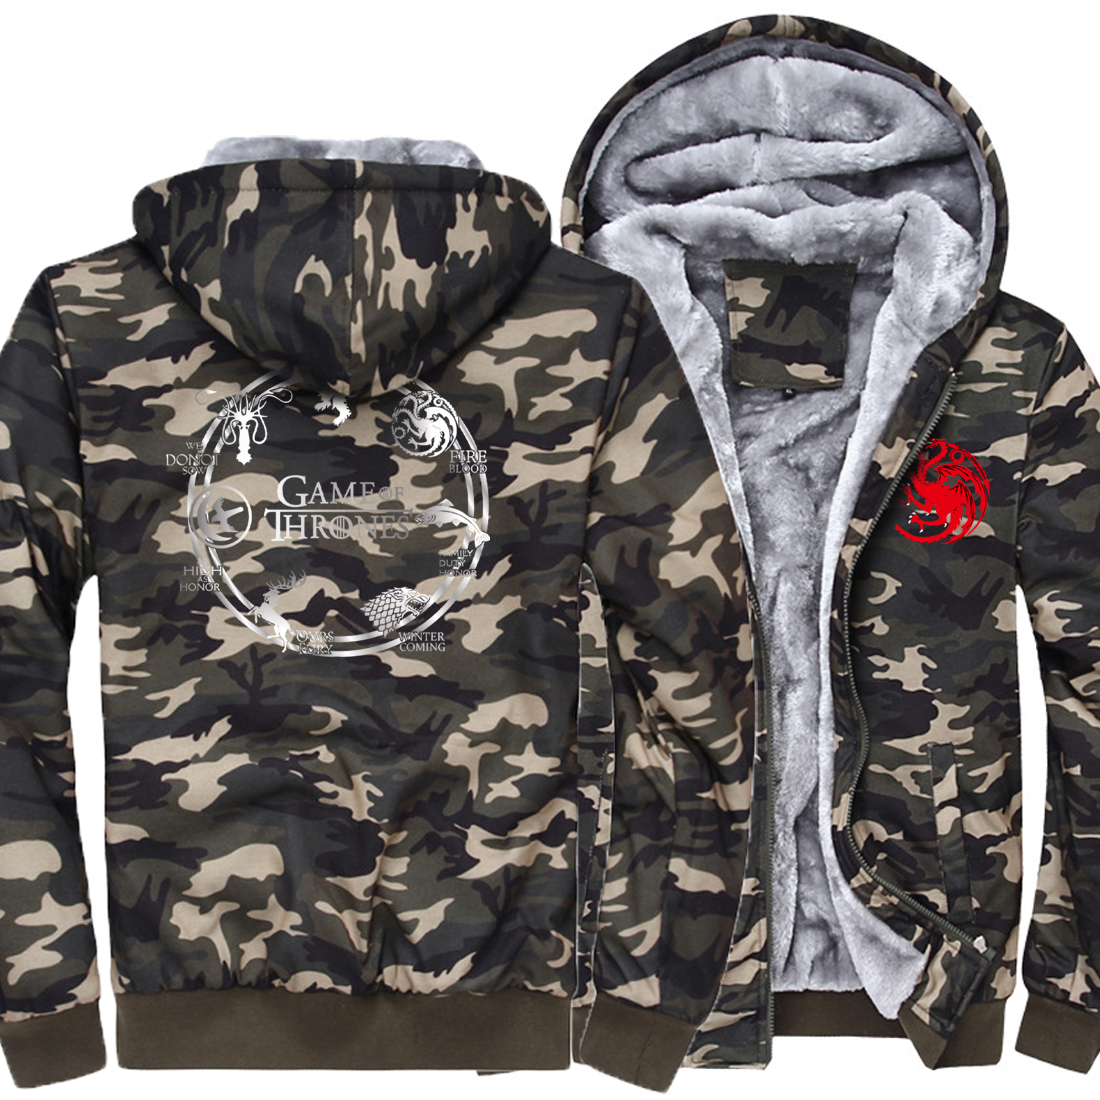 Game of Thrones Hipster Men Hoodies New Arrival 2019 Winter Sweatshirts House Stark Fire & Brand-Clothing Blood Hoody Harajuku